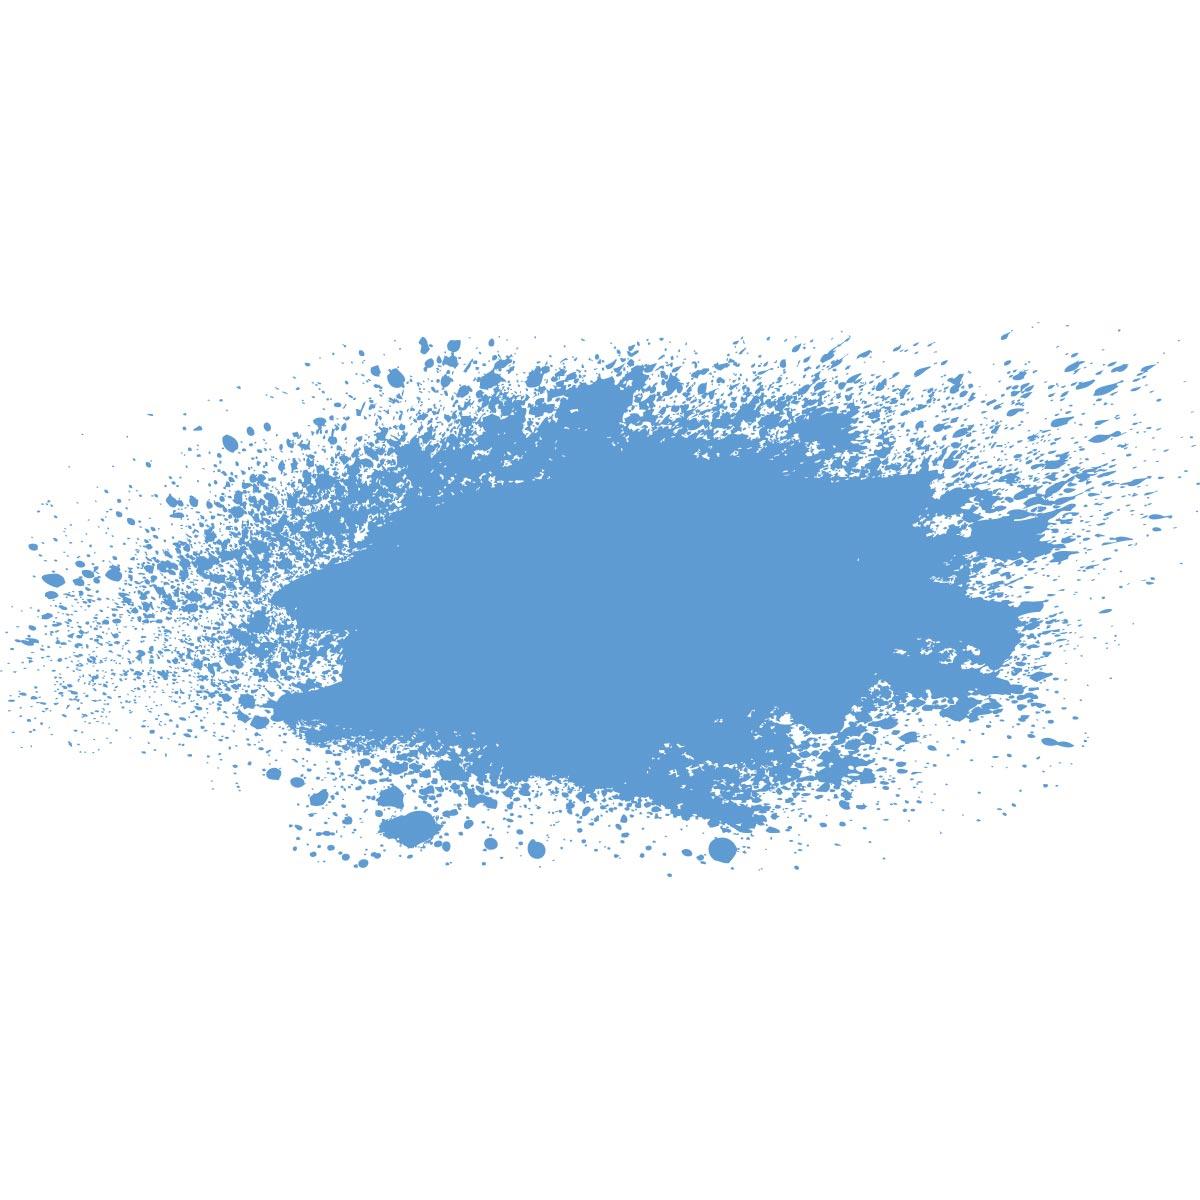 FolkArt ® Stencil Spray™ Acrylic Paint - Bright Blue, 2 oz. - 6191